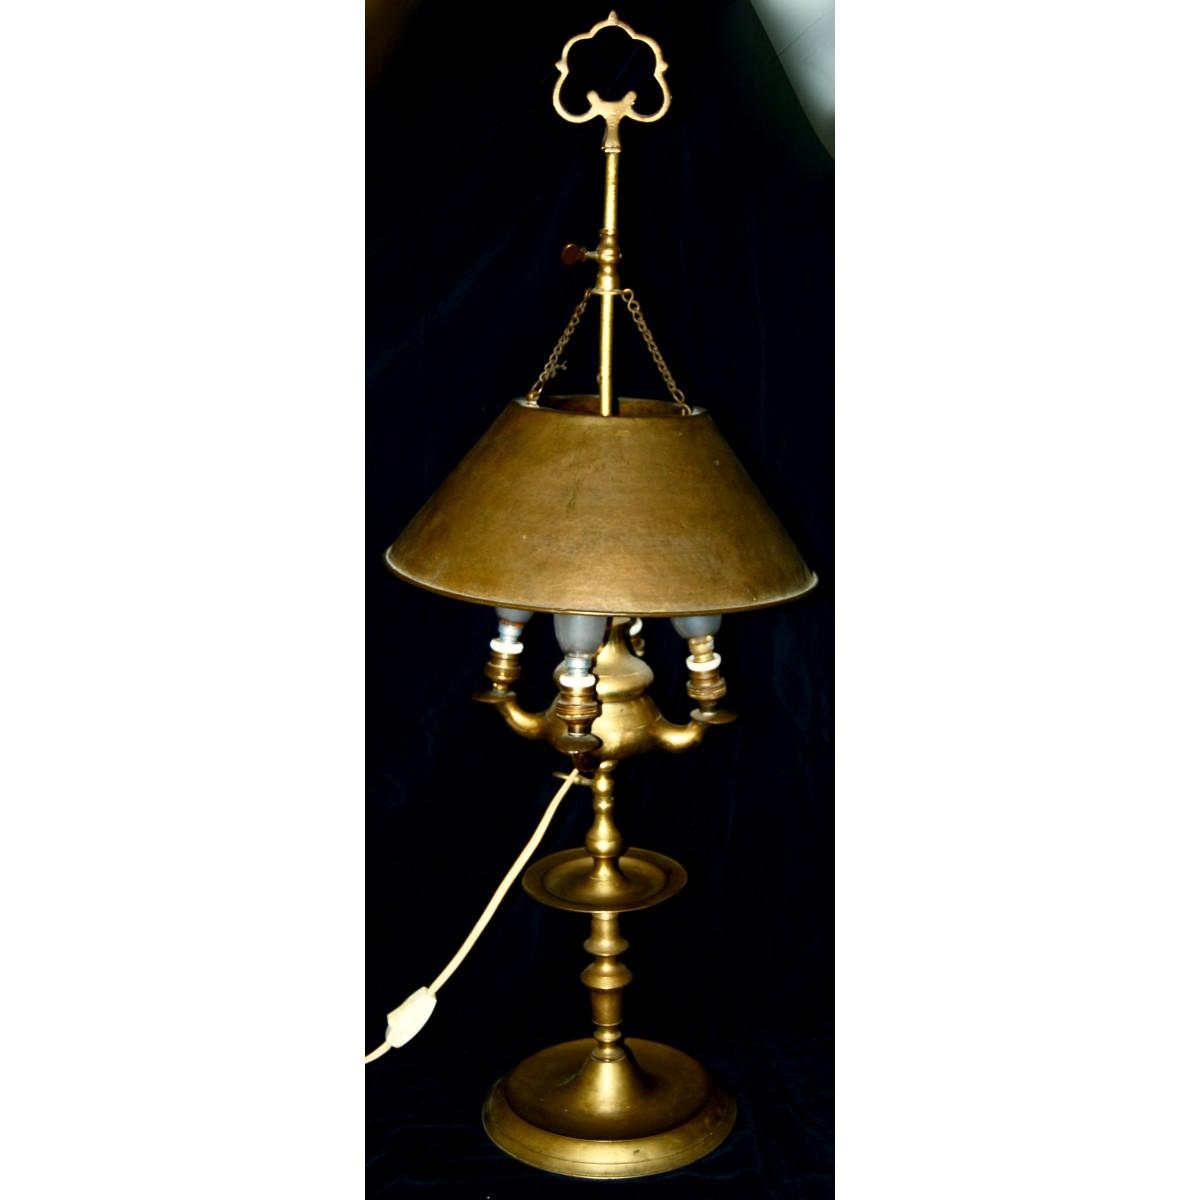 Lampara de aceite de bronce, siglo XIX.